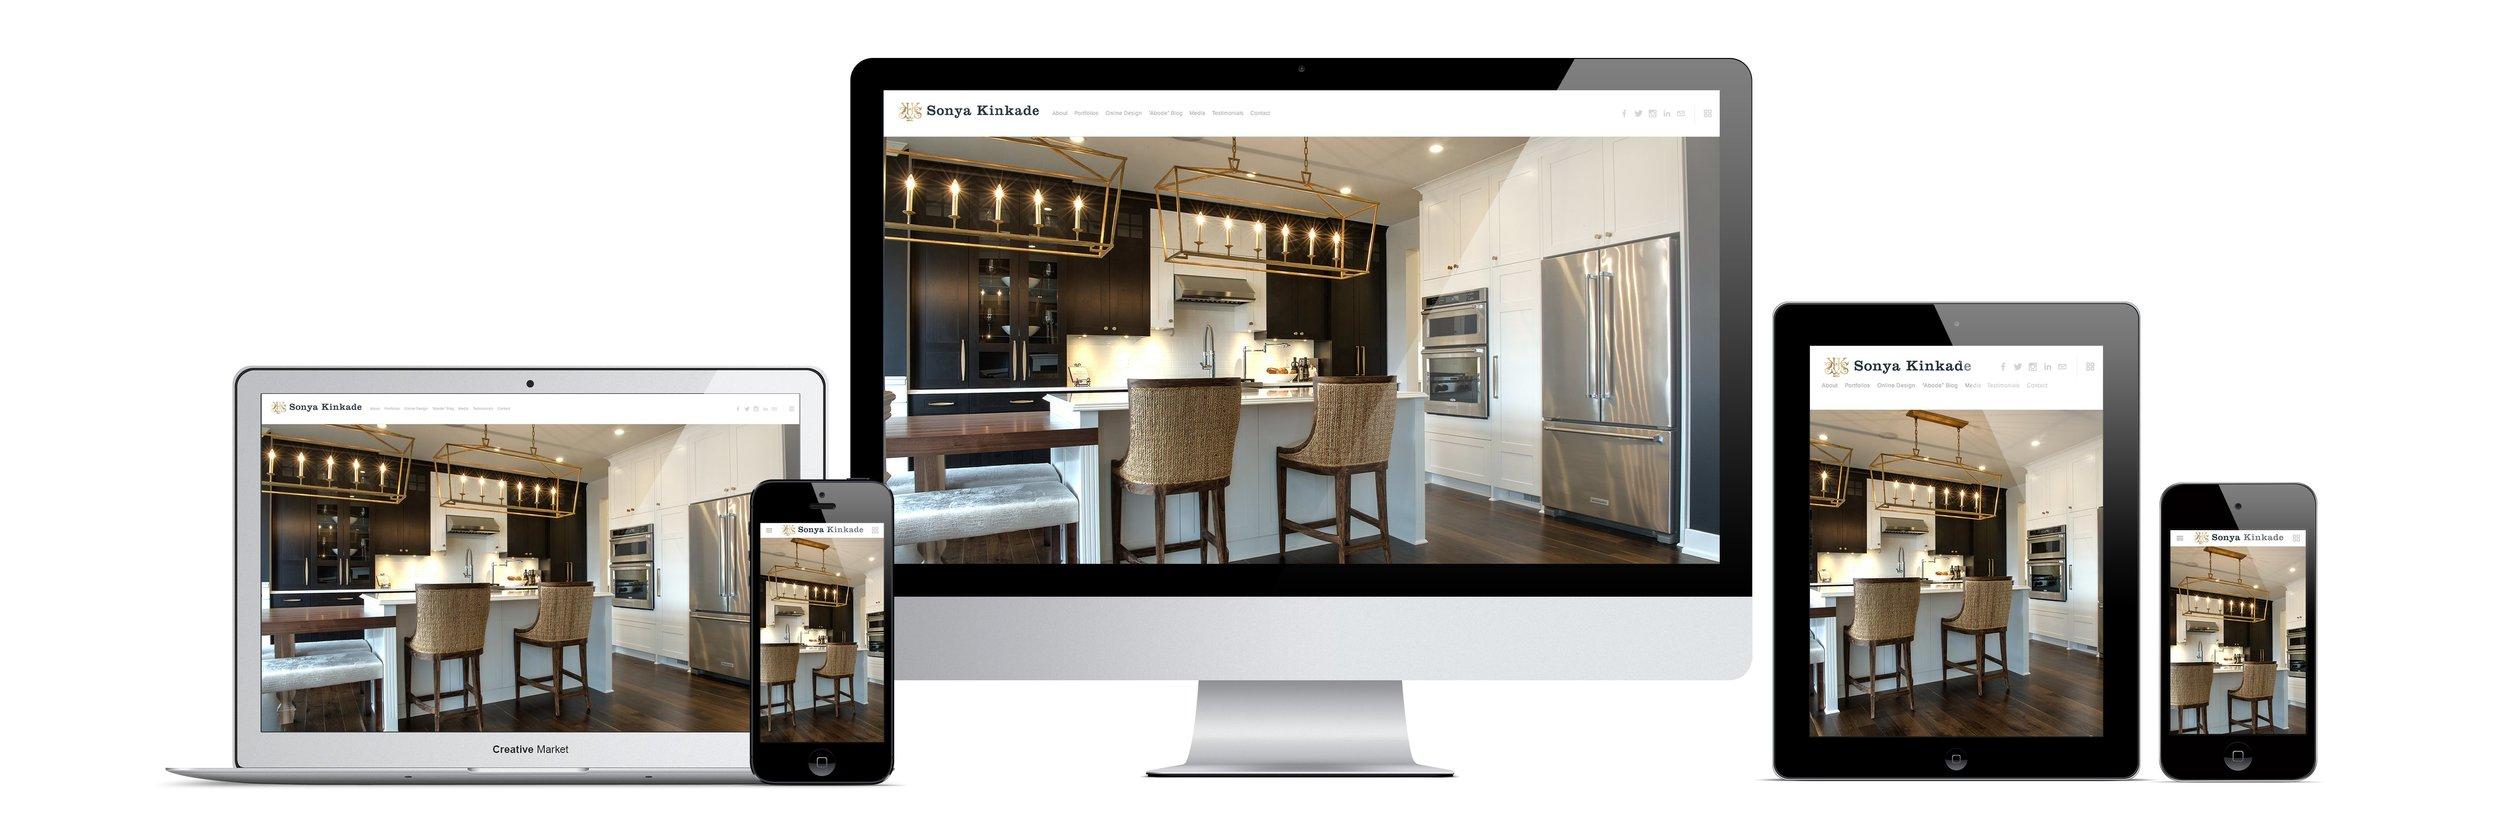 Website Design: www.yourfertility.ca